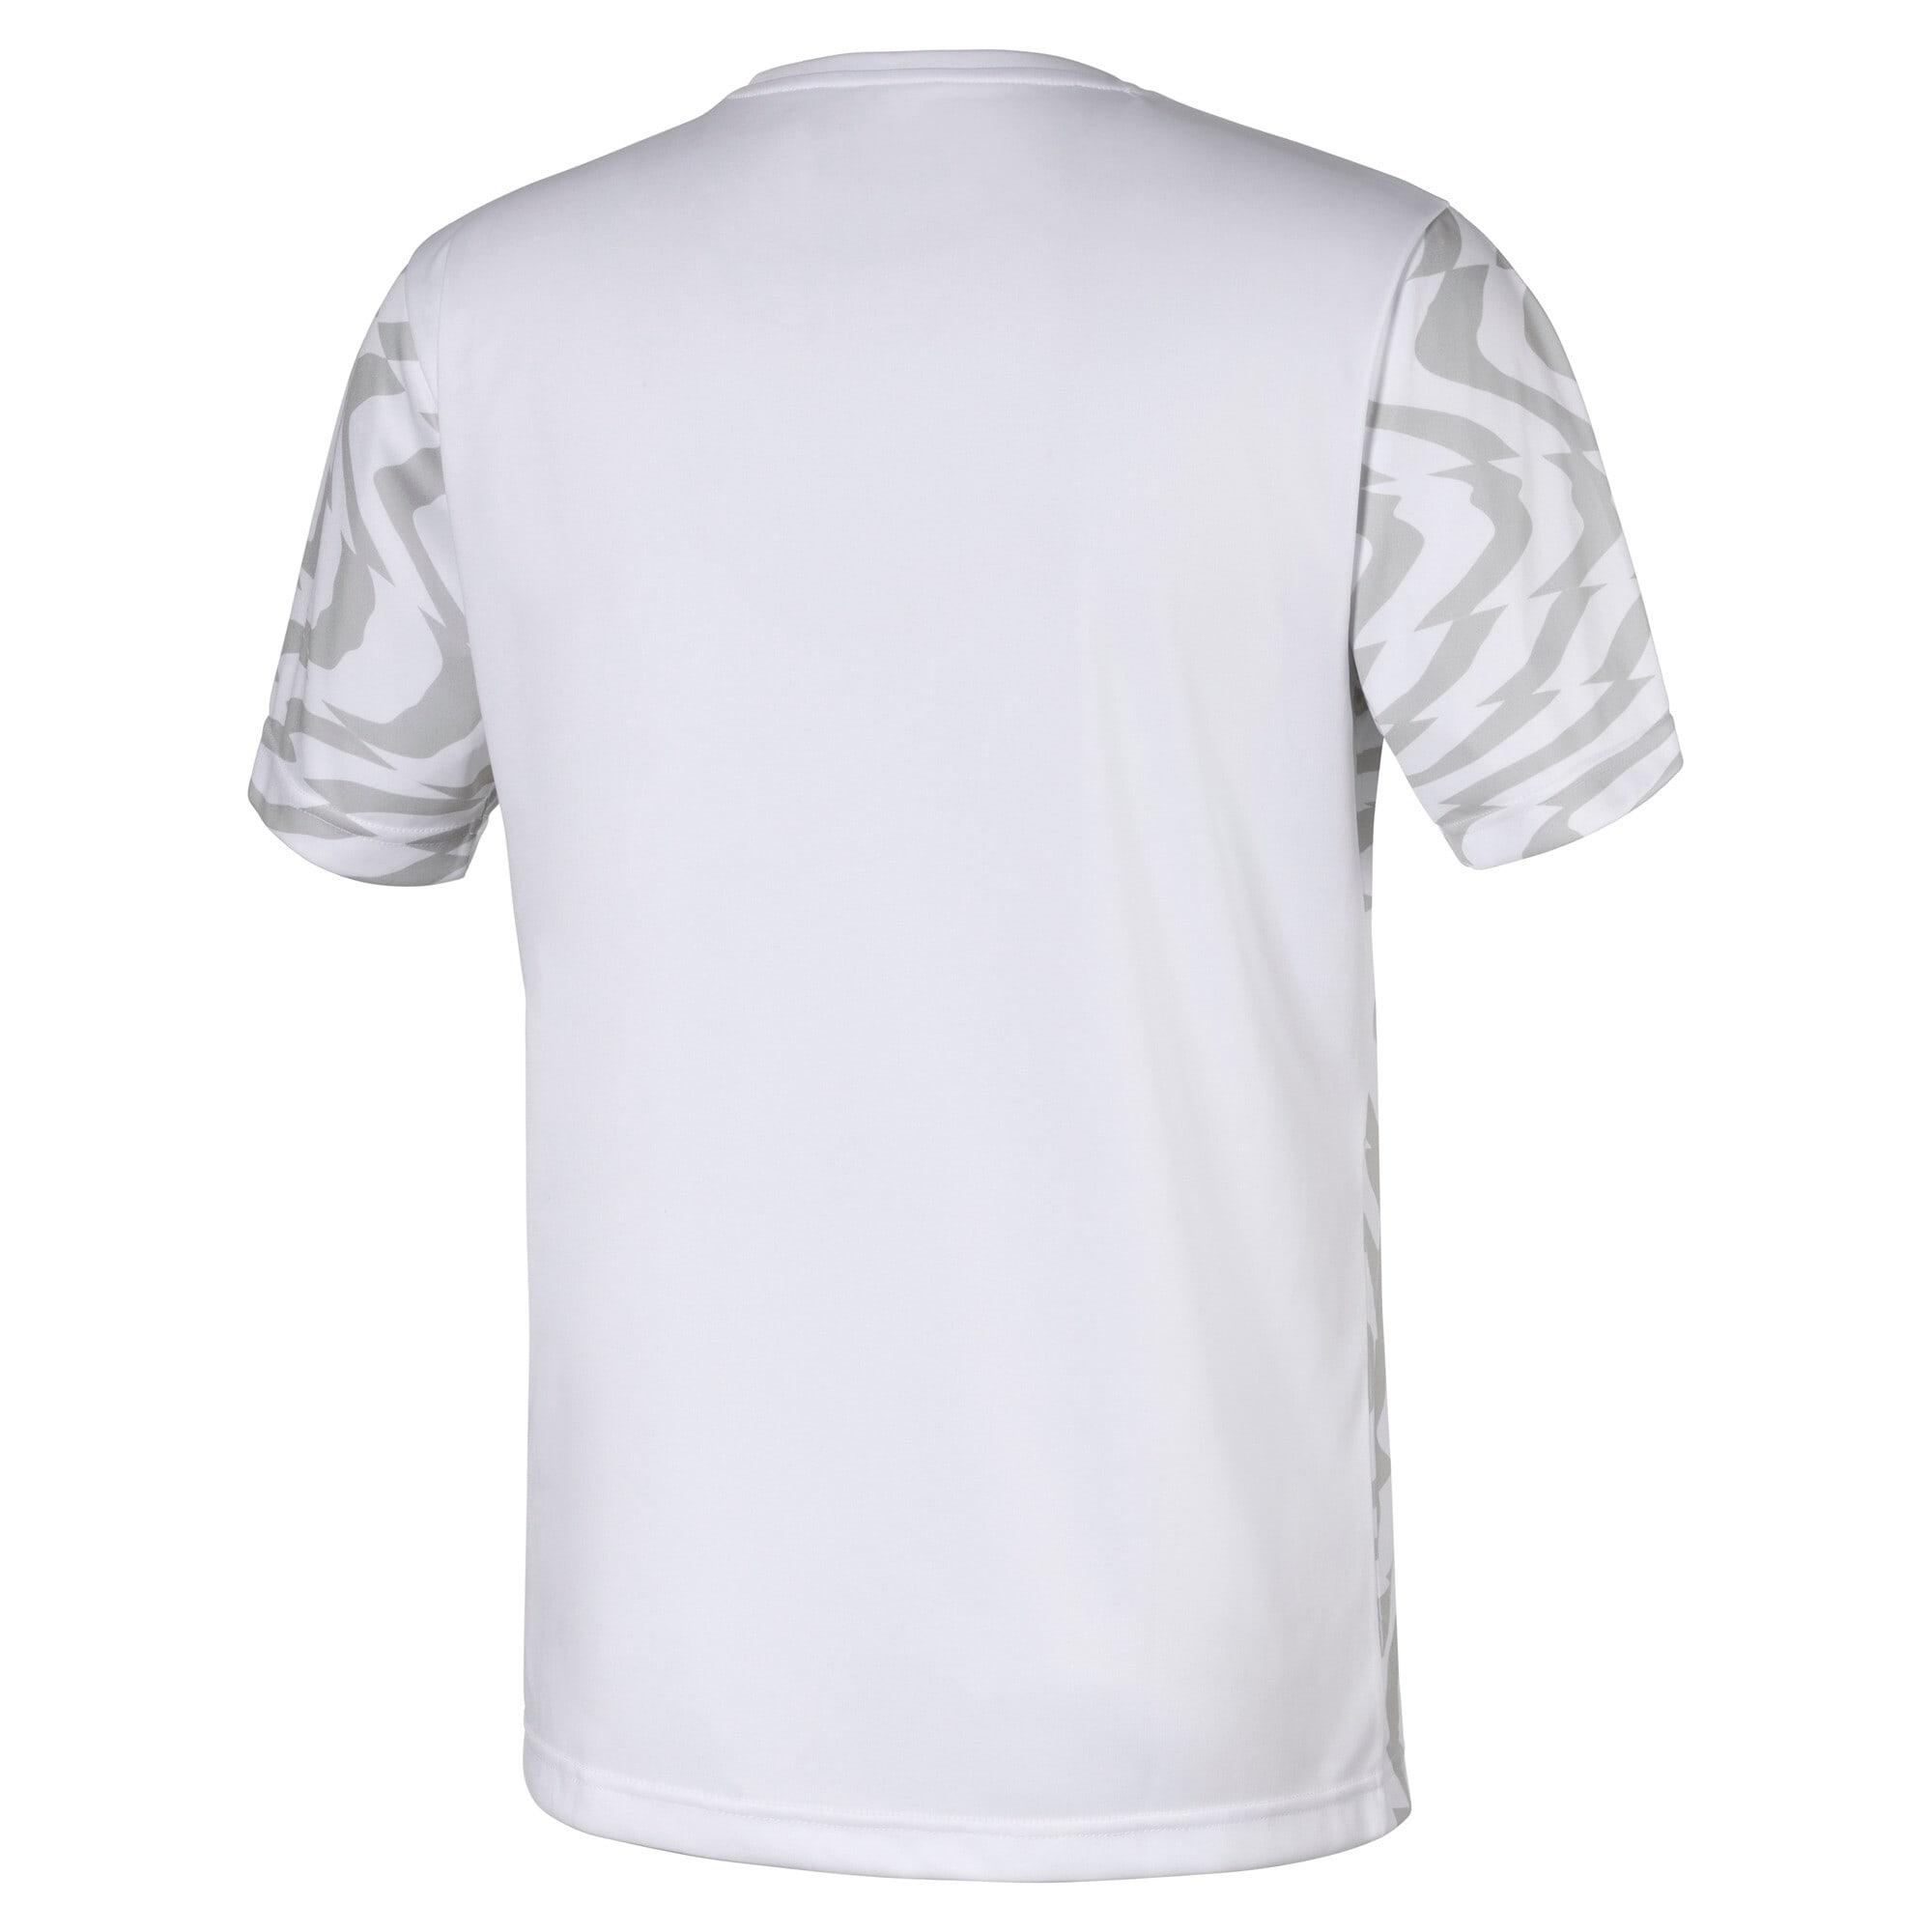 Thumbnail 2 of Egypt Men's Away Replica Jersey, Puma White-Puma Black, medium